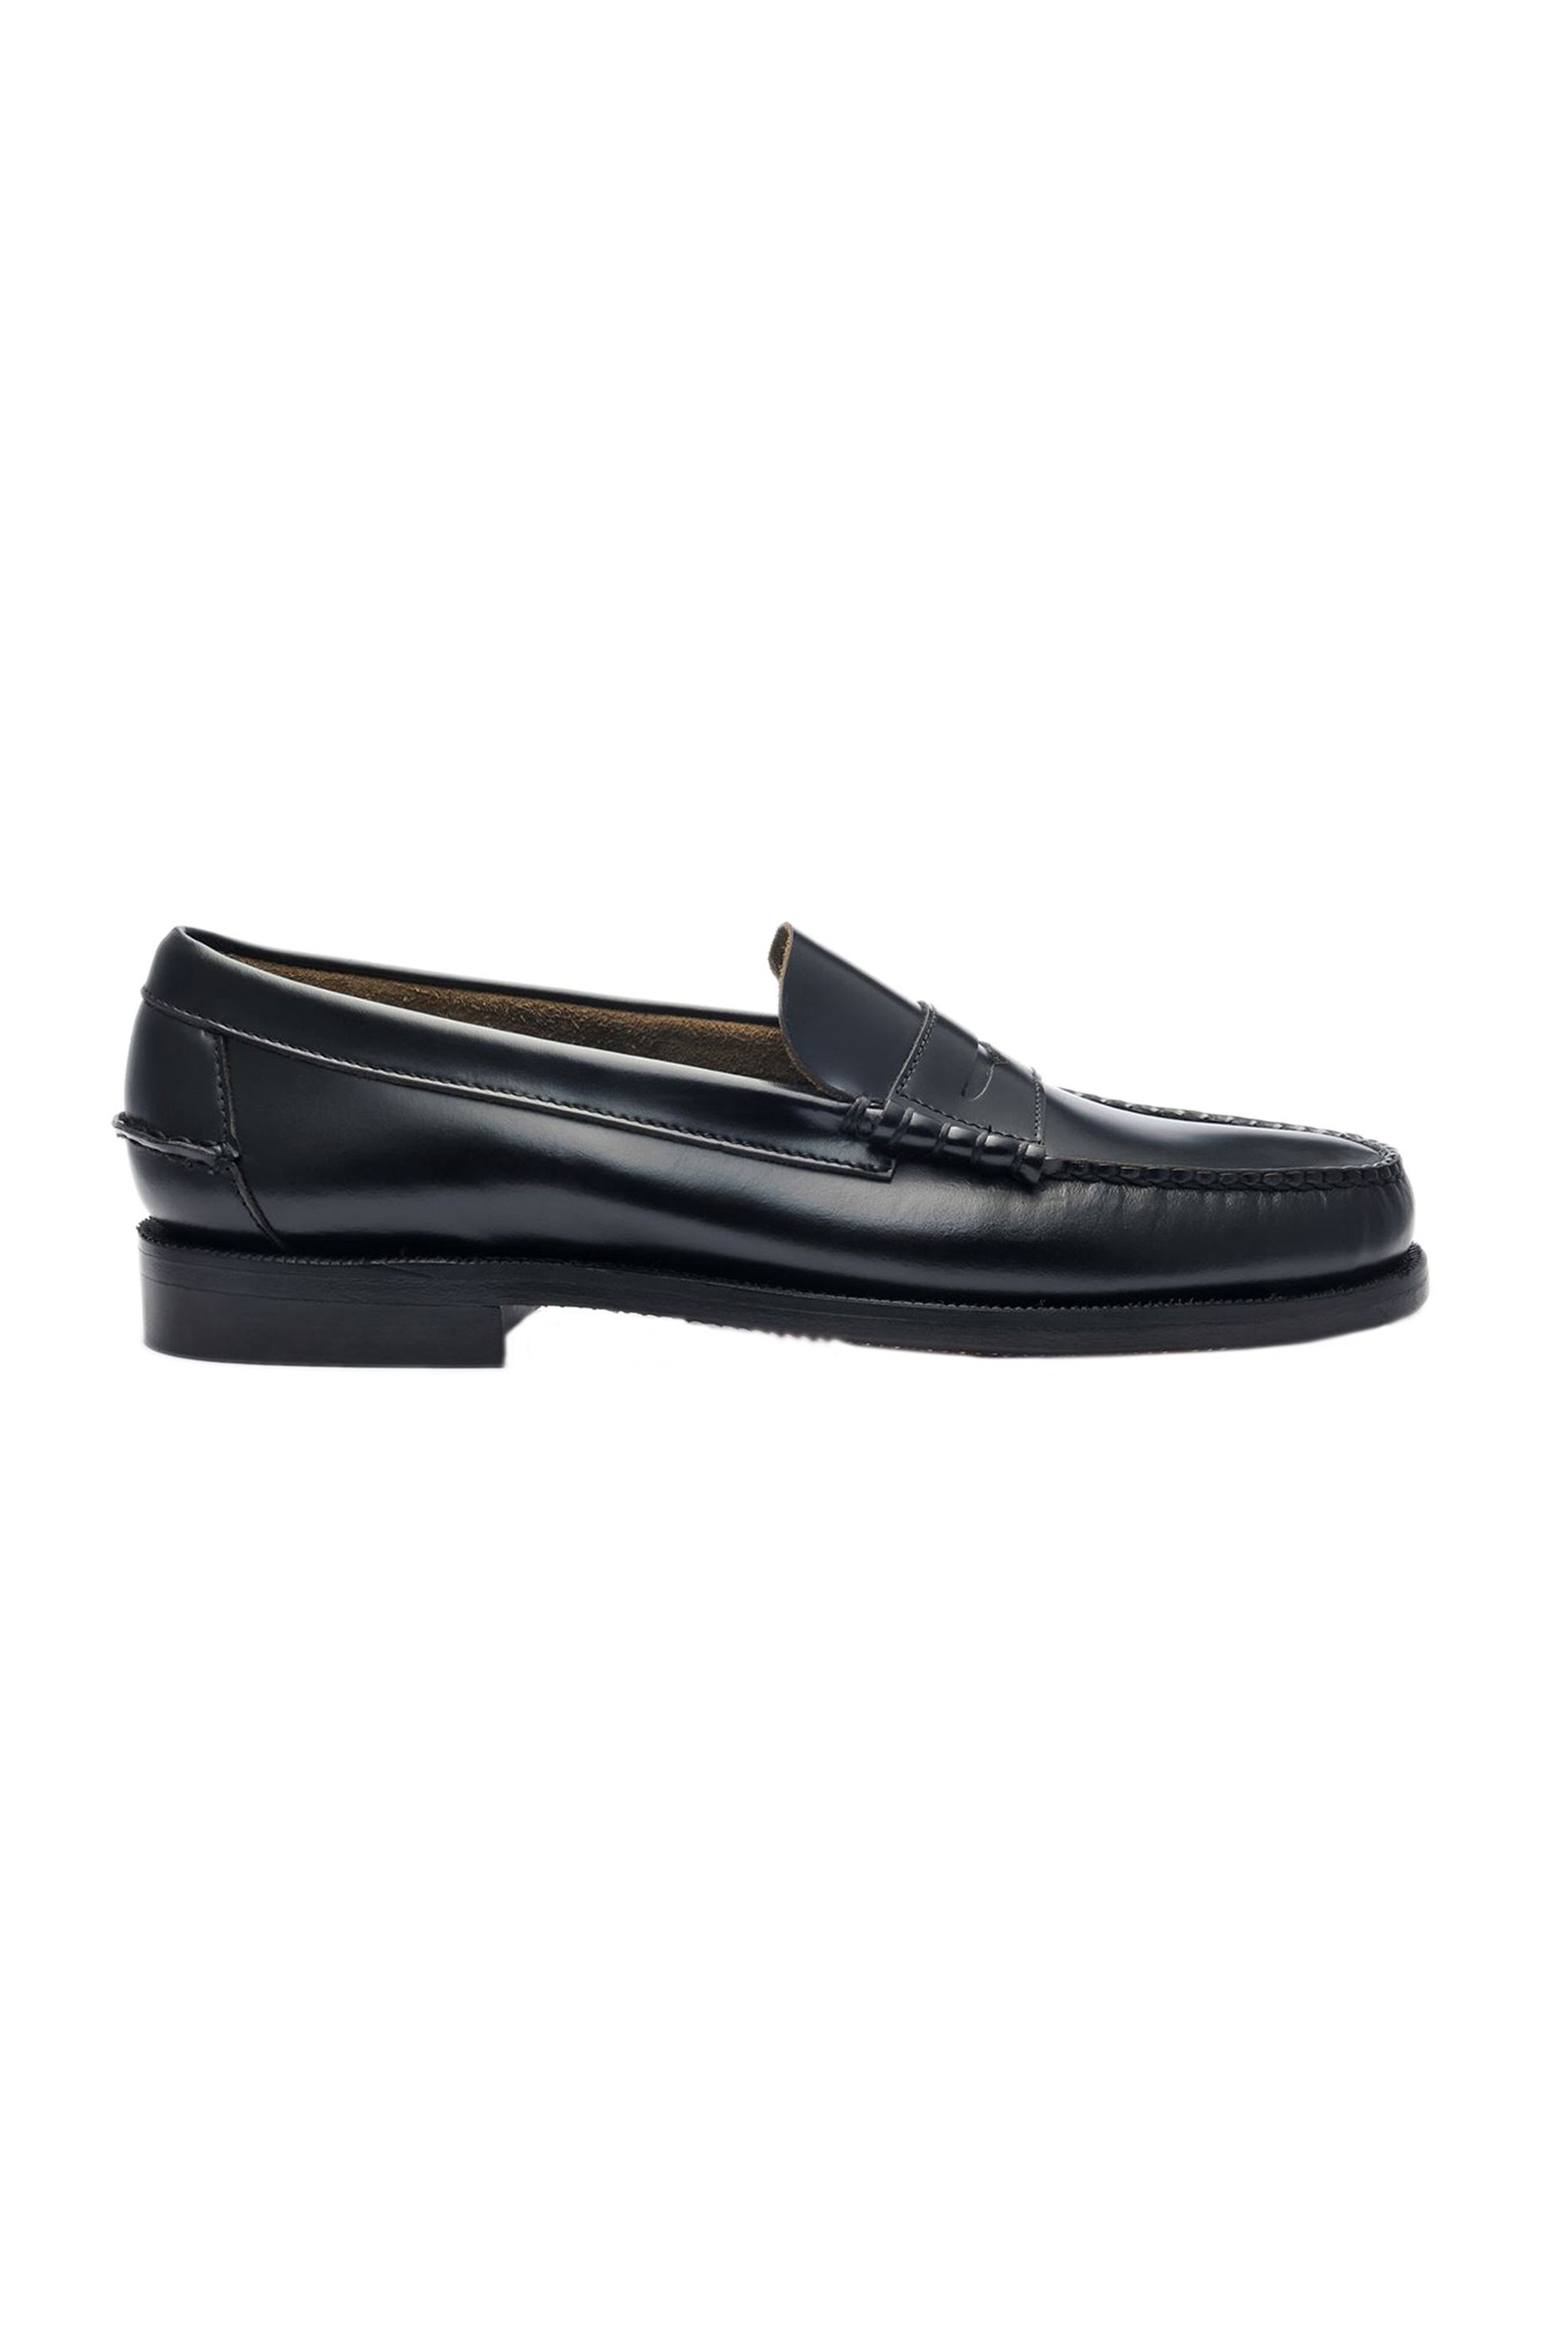 "Sebago® ανδρικά penny loafers δερμάτινα ""Classic Dan "" – L7000300-902W – Μαύρο"